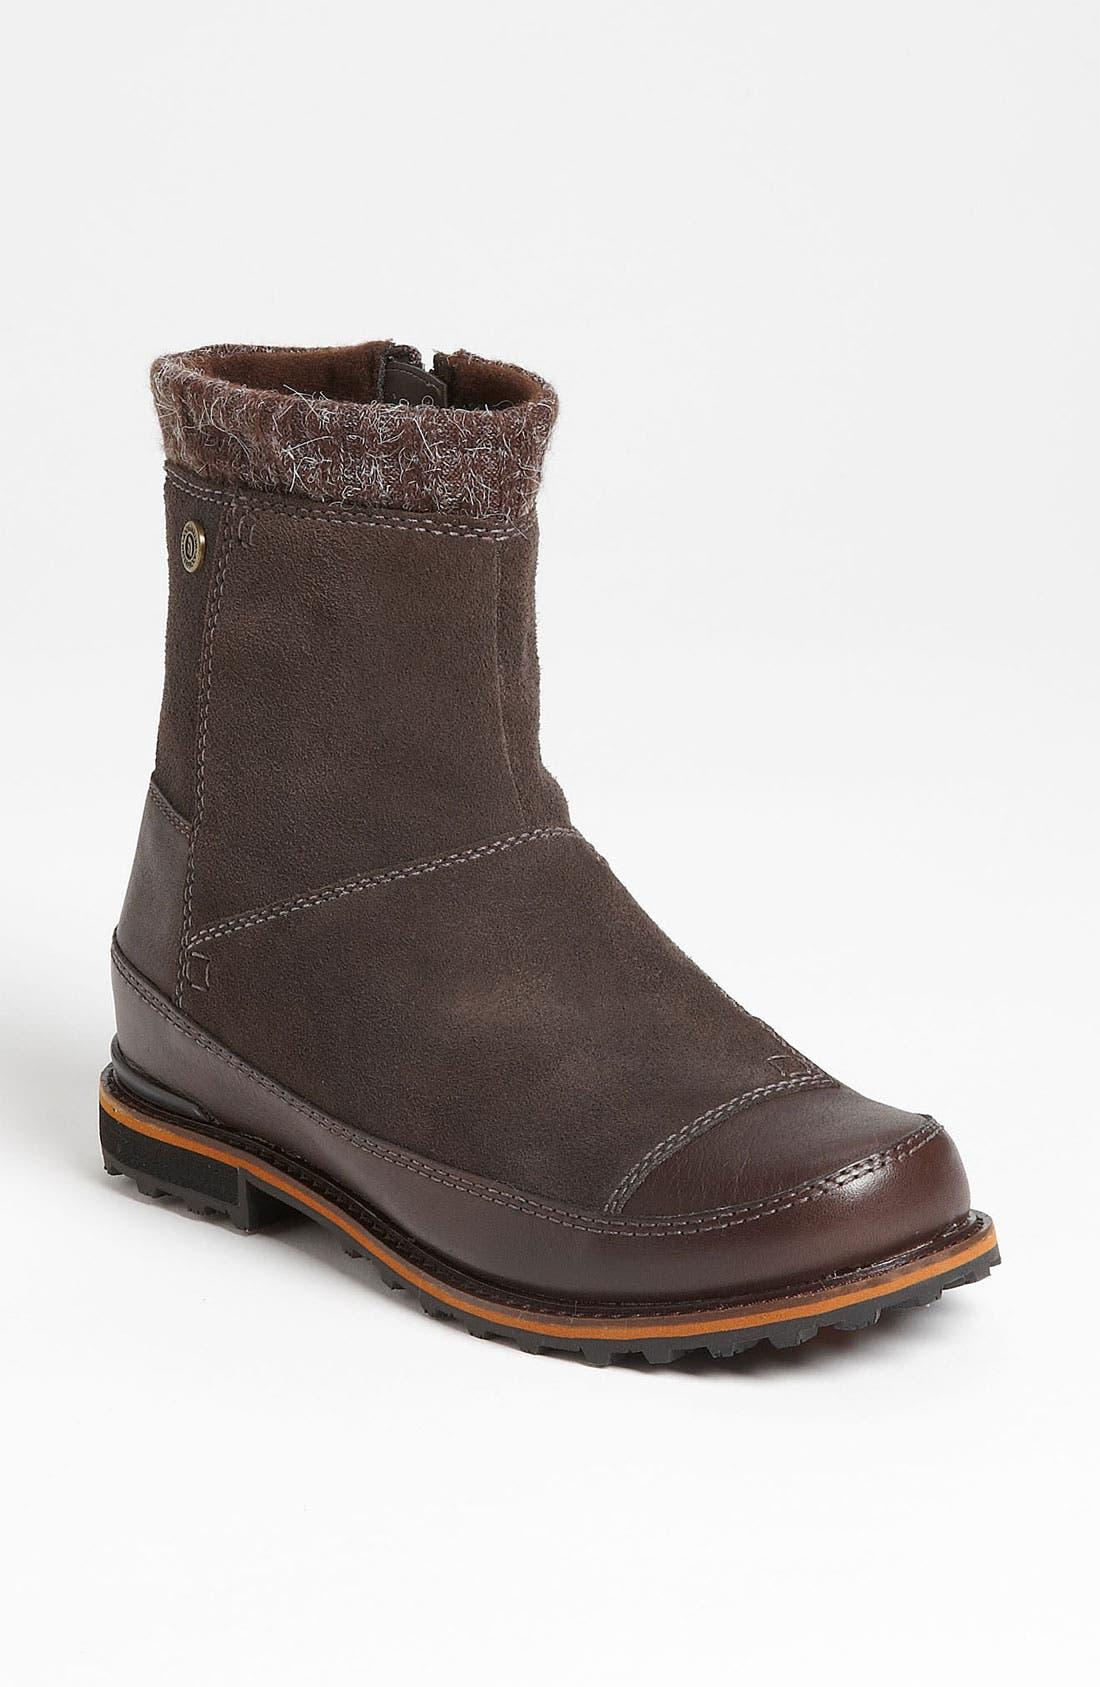 Main Image - The North Face 'Snowtropolis Mid' Boot